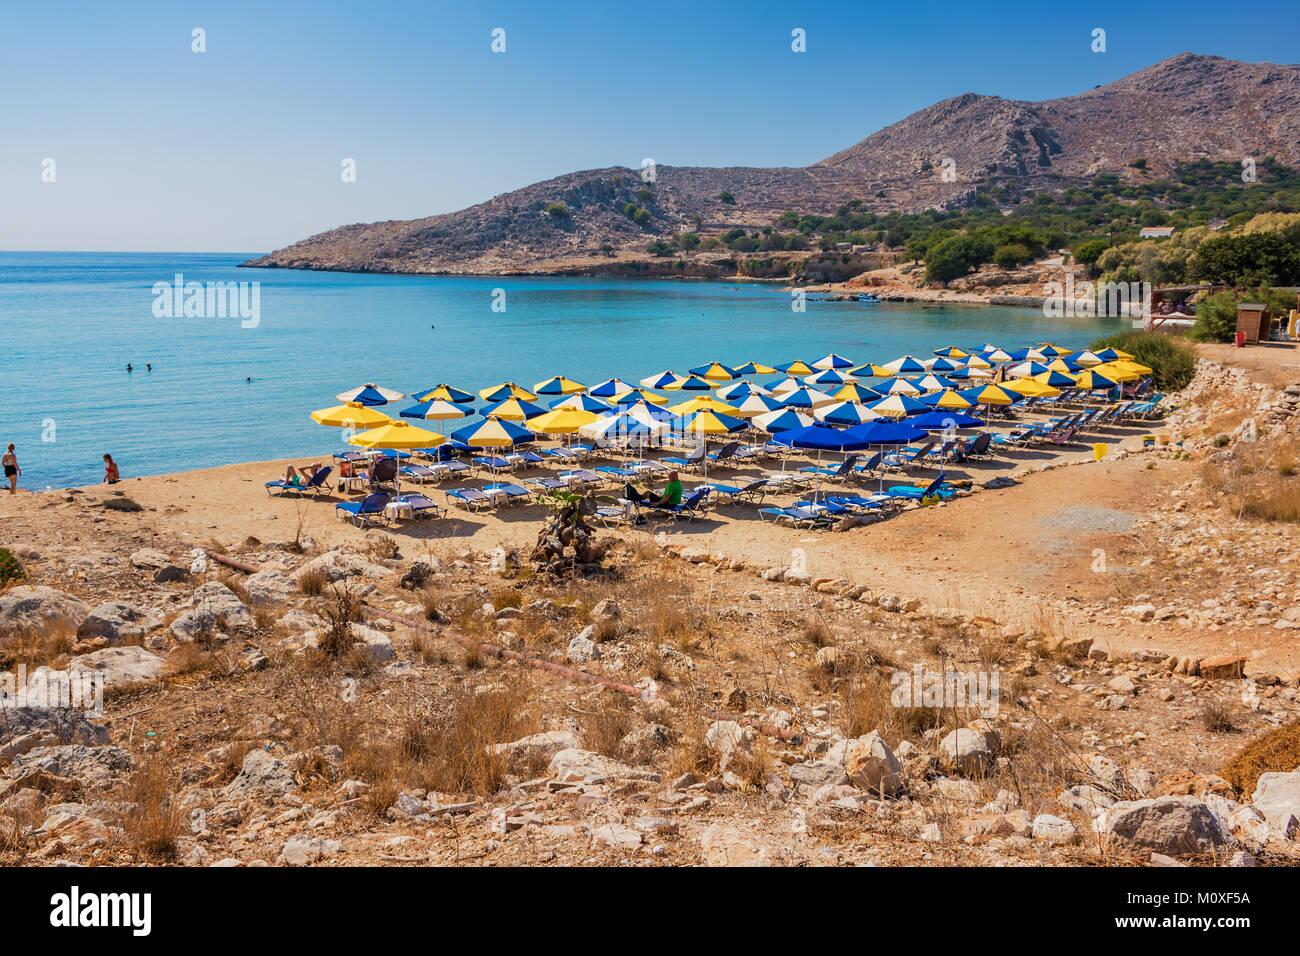 Pontamos beach - most popular beach on island of Halki (Greece) - Stock Image